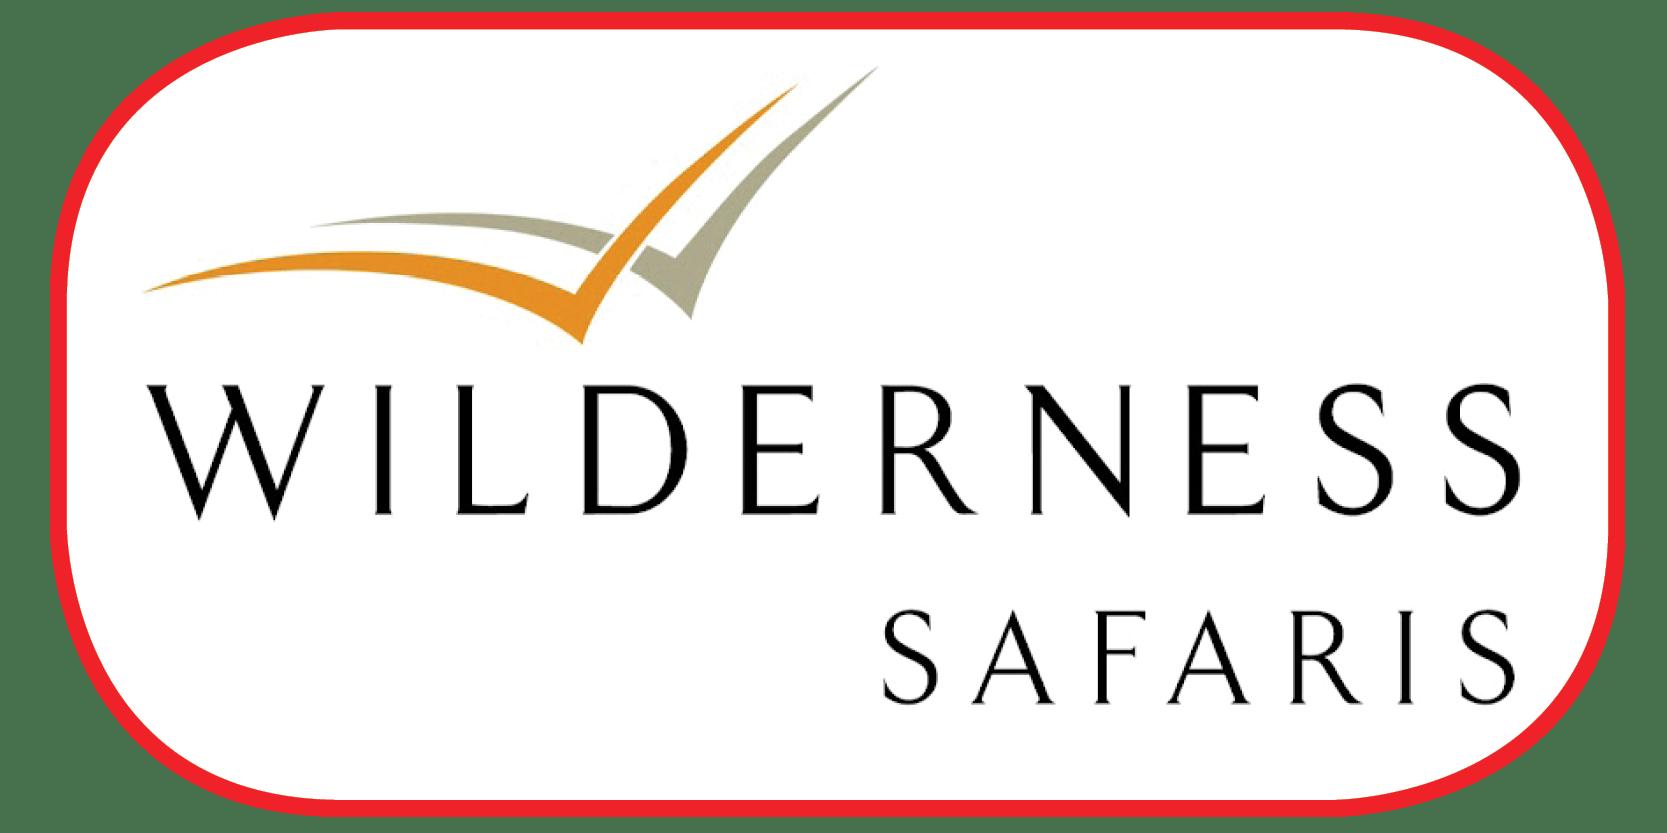 Wilderness Safaris design for testimonials logos